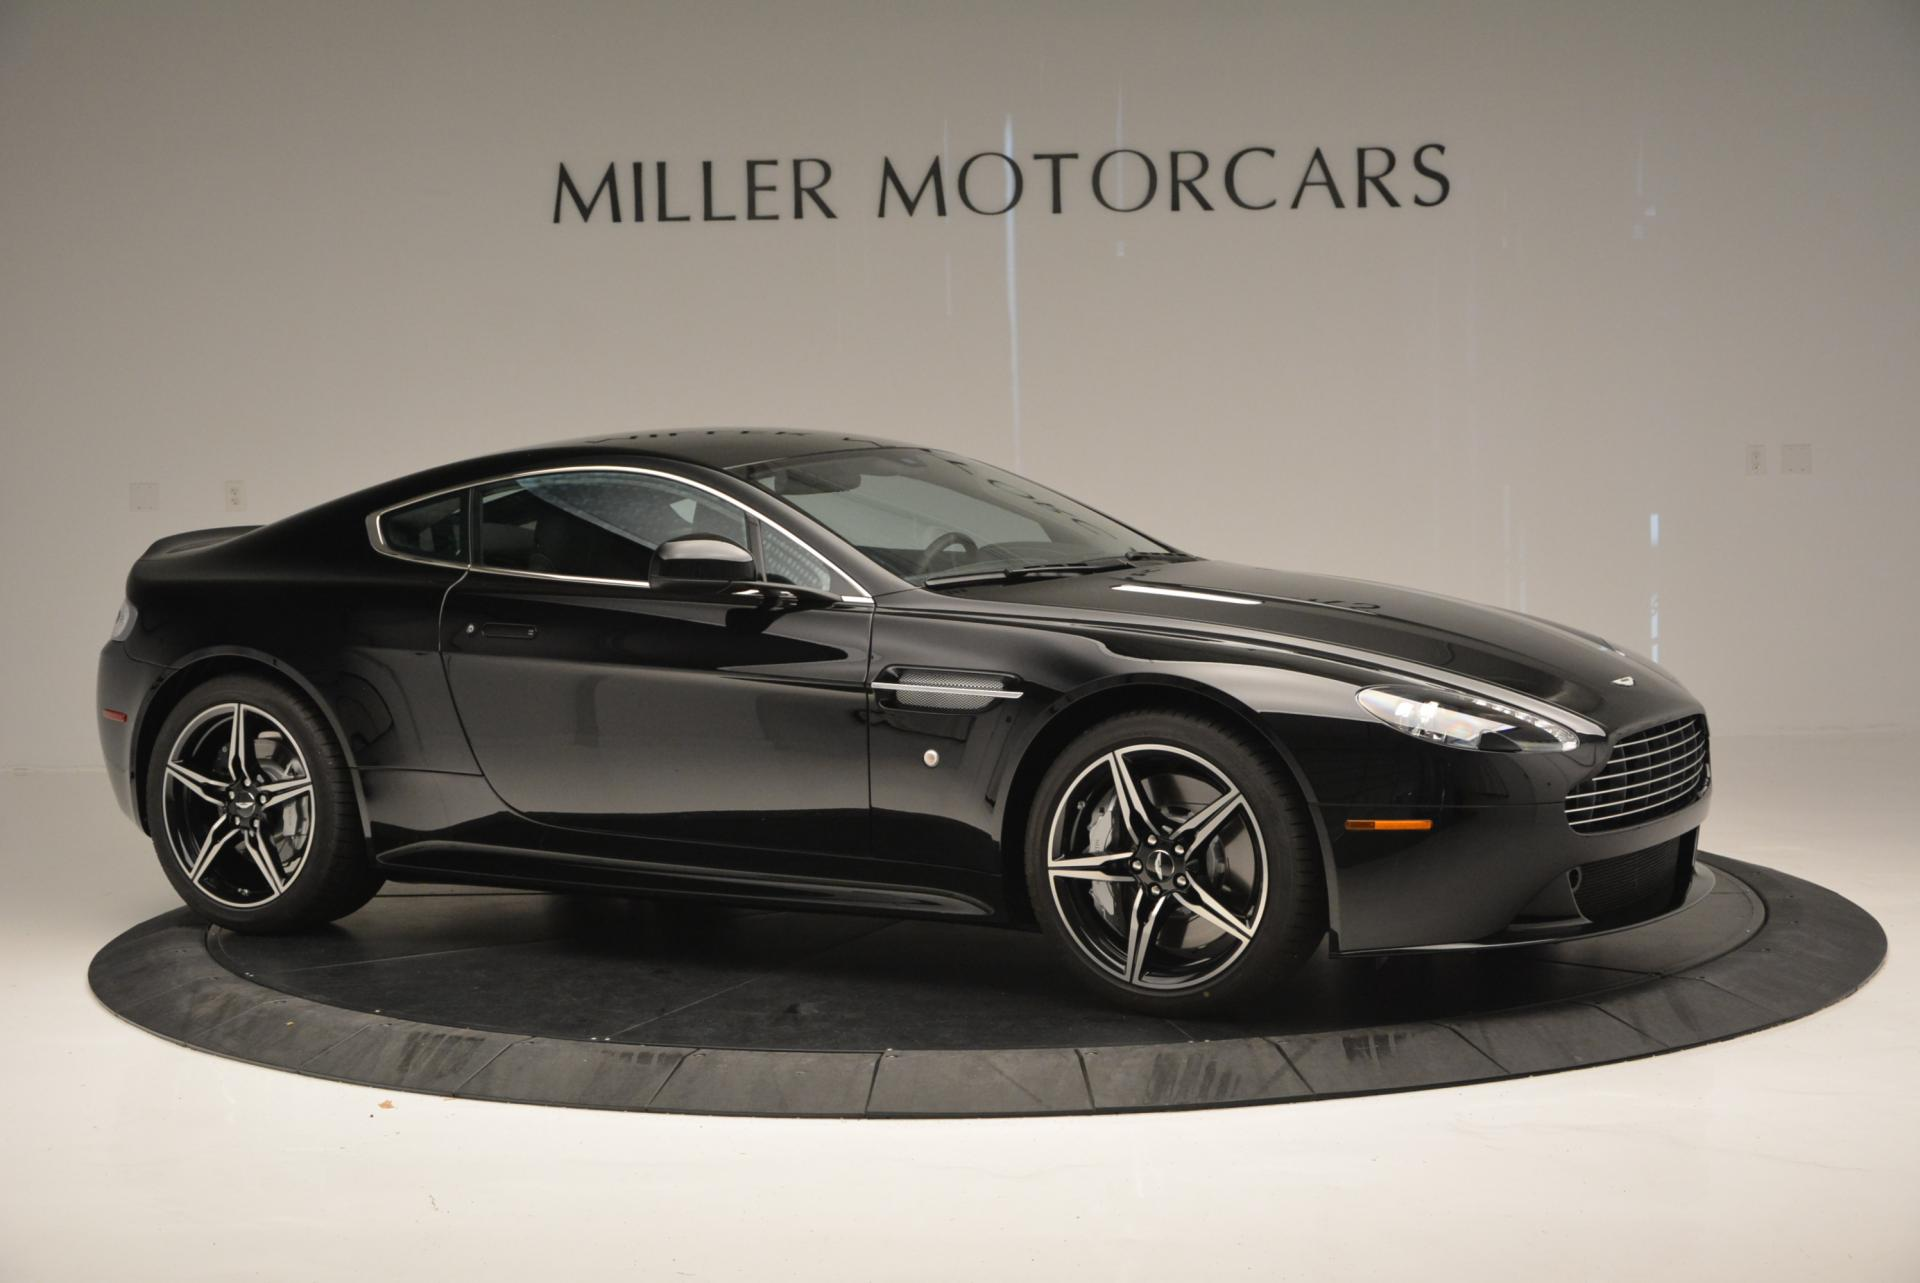 New 2016 Aston Martin V8 Vantage GTS S For Sale In Greenwich, CT 526_p8